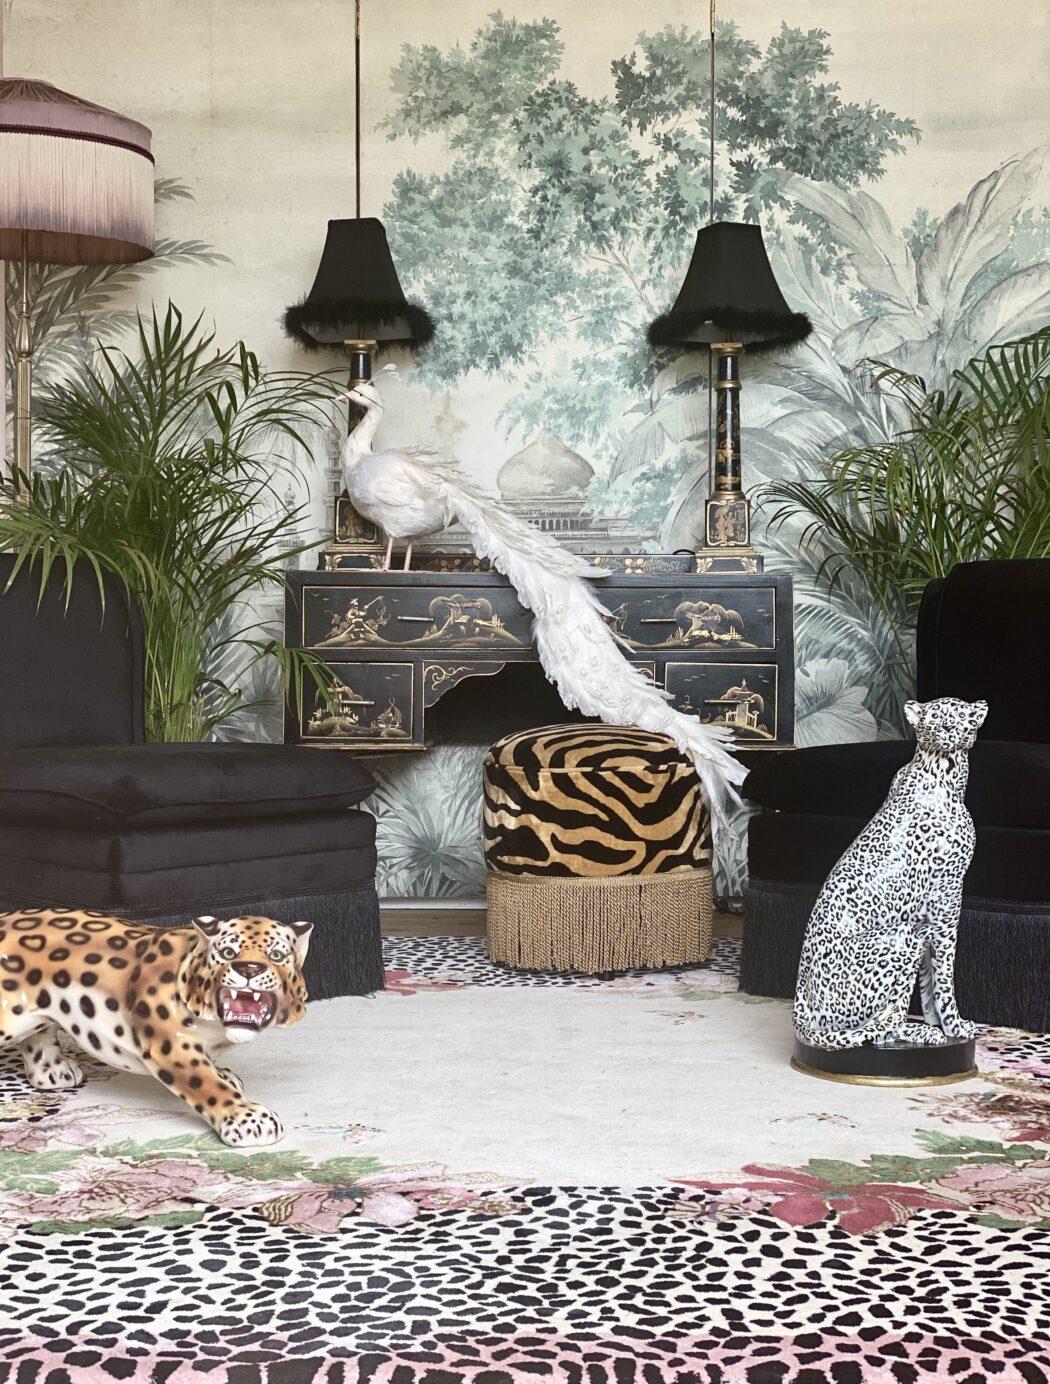 Animal decor rug